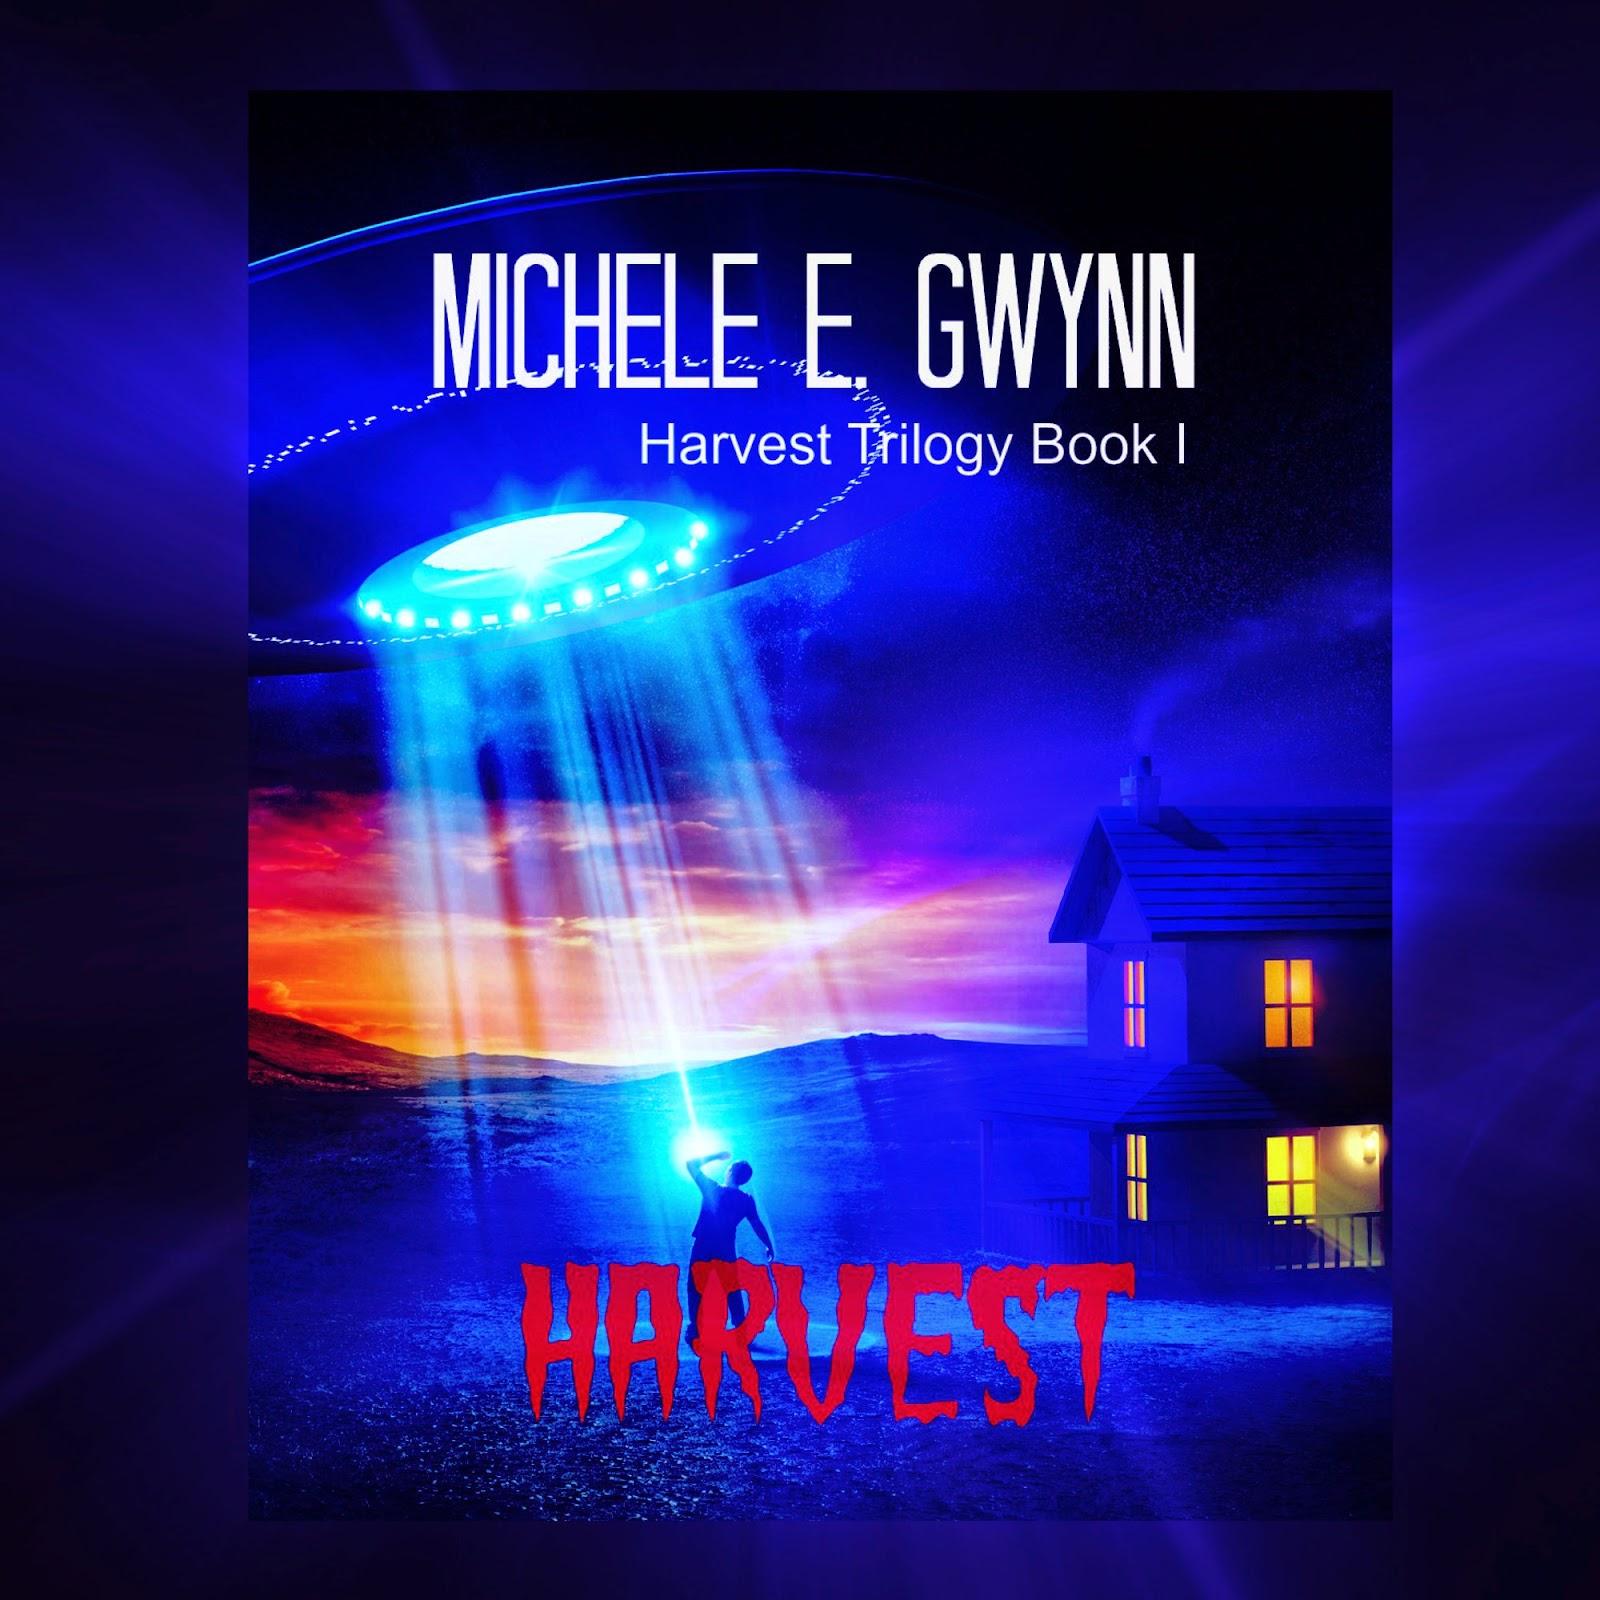 http://www.amazon.com/Harvest-Trilogy-Book-1/dp/B00Q730F0E/ref=sr_1_1?ie=UTF8&qid=1417033818&sr=8-1&keywords=MICHELE+GWYNN+Harvest+audiobook